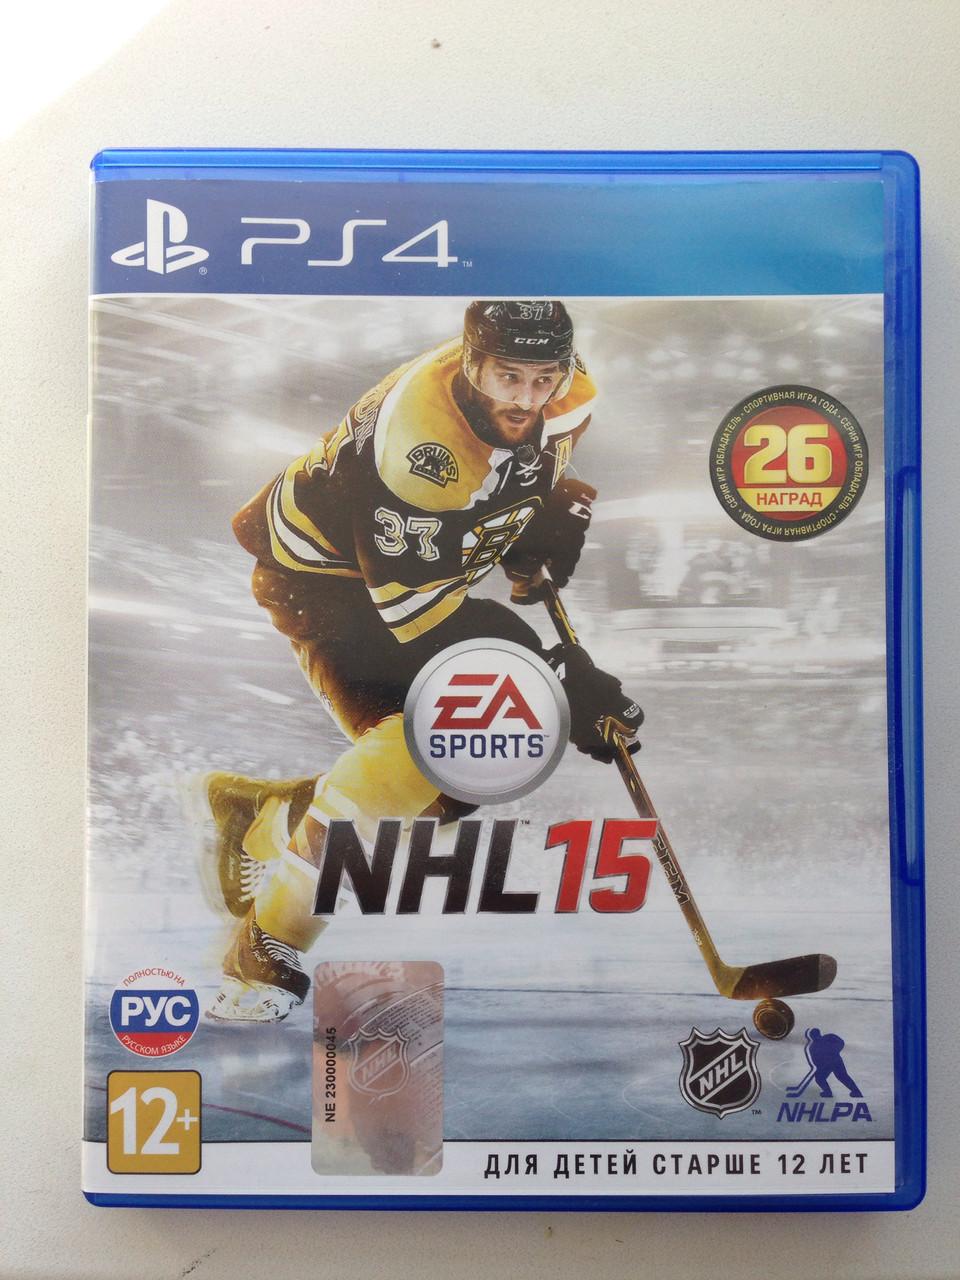 NHL 15 (PS4) pyc.